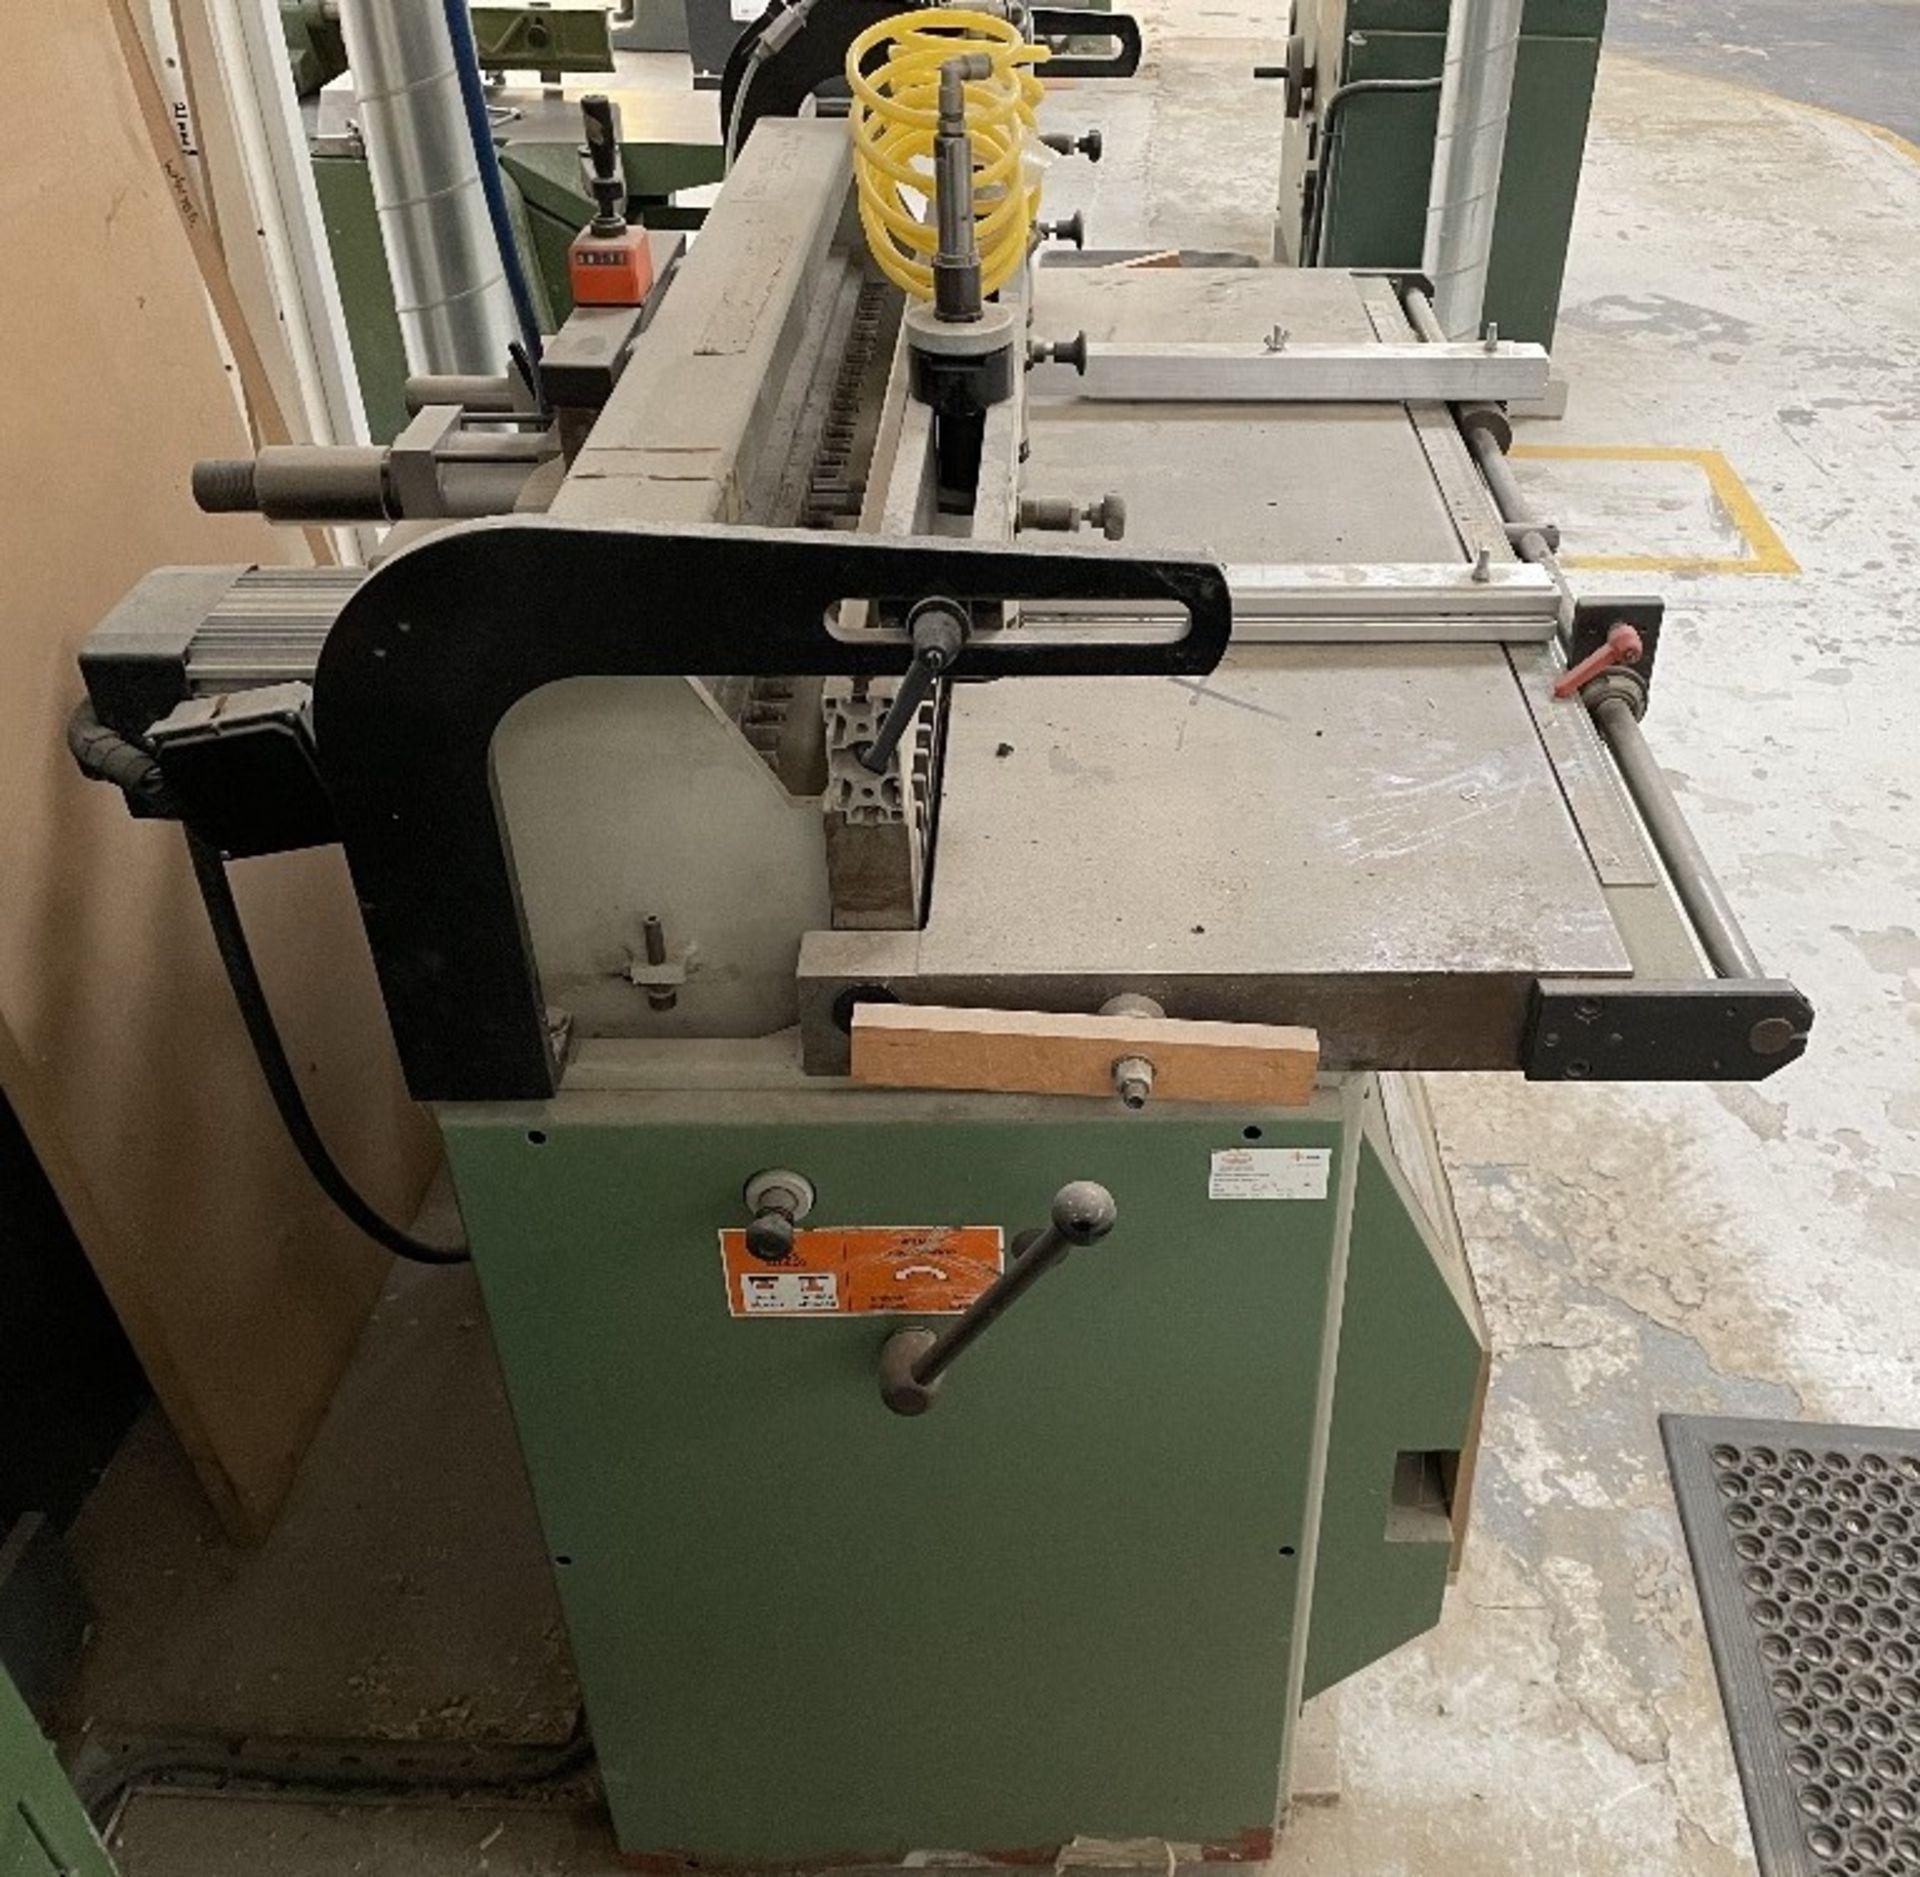 Maggi 3532 4 Head Boring Machine w/ Tool Cabinet & Tooling | YOM: 1999 - Image 5 of 12